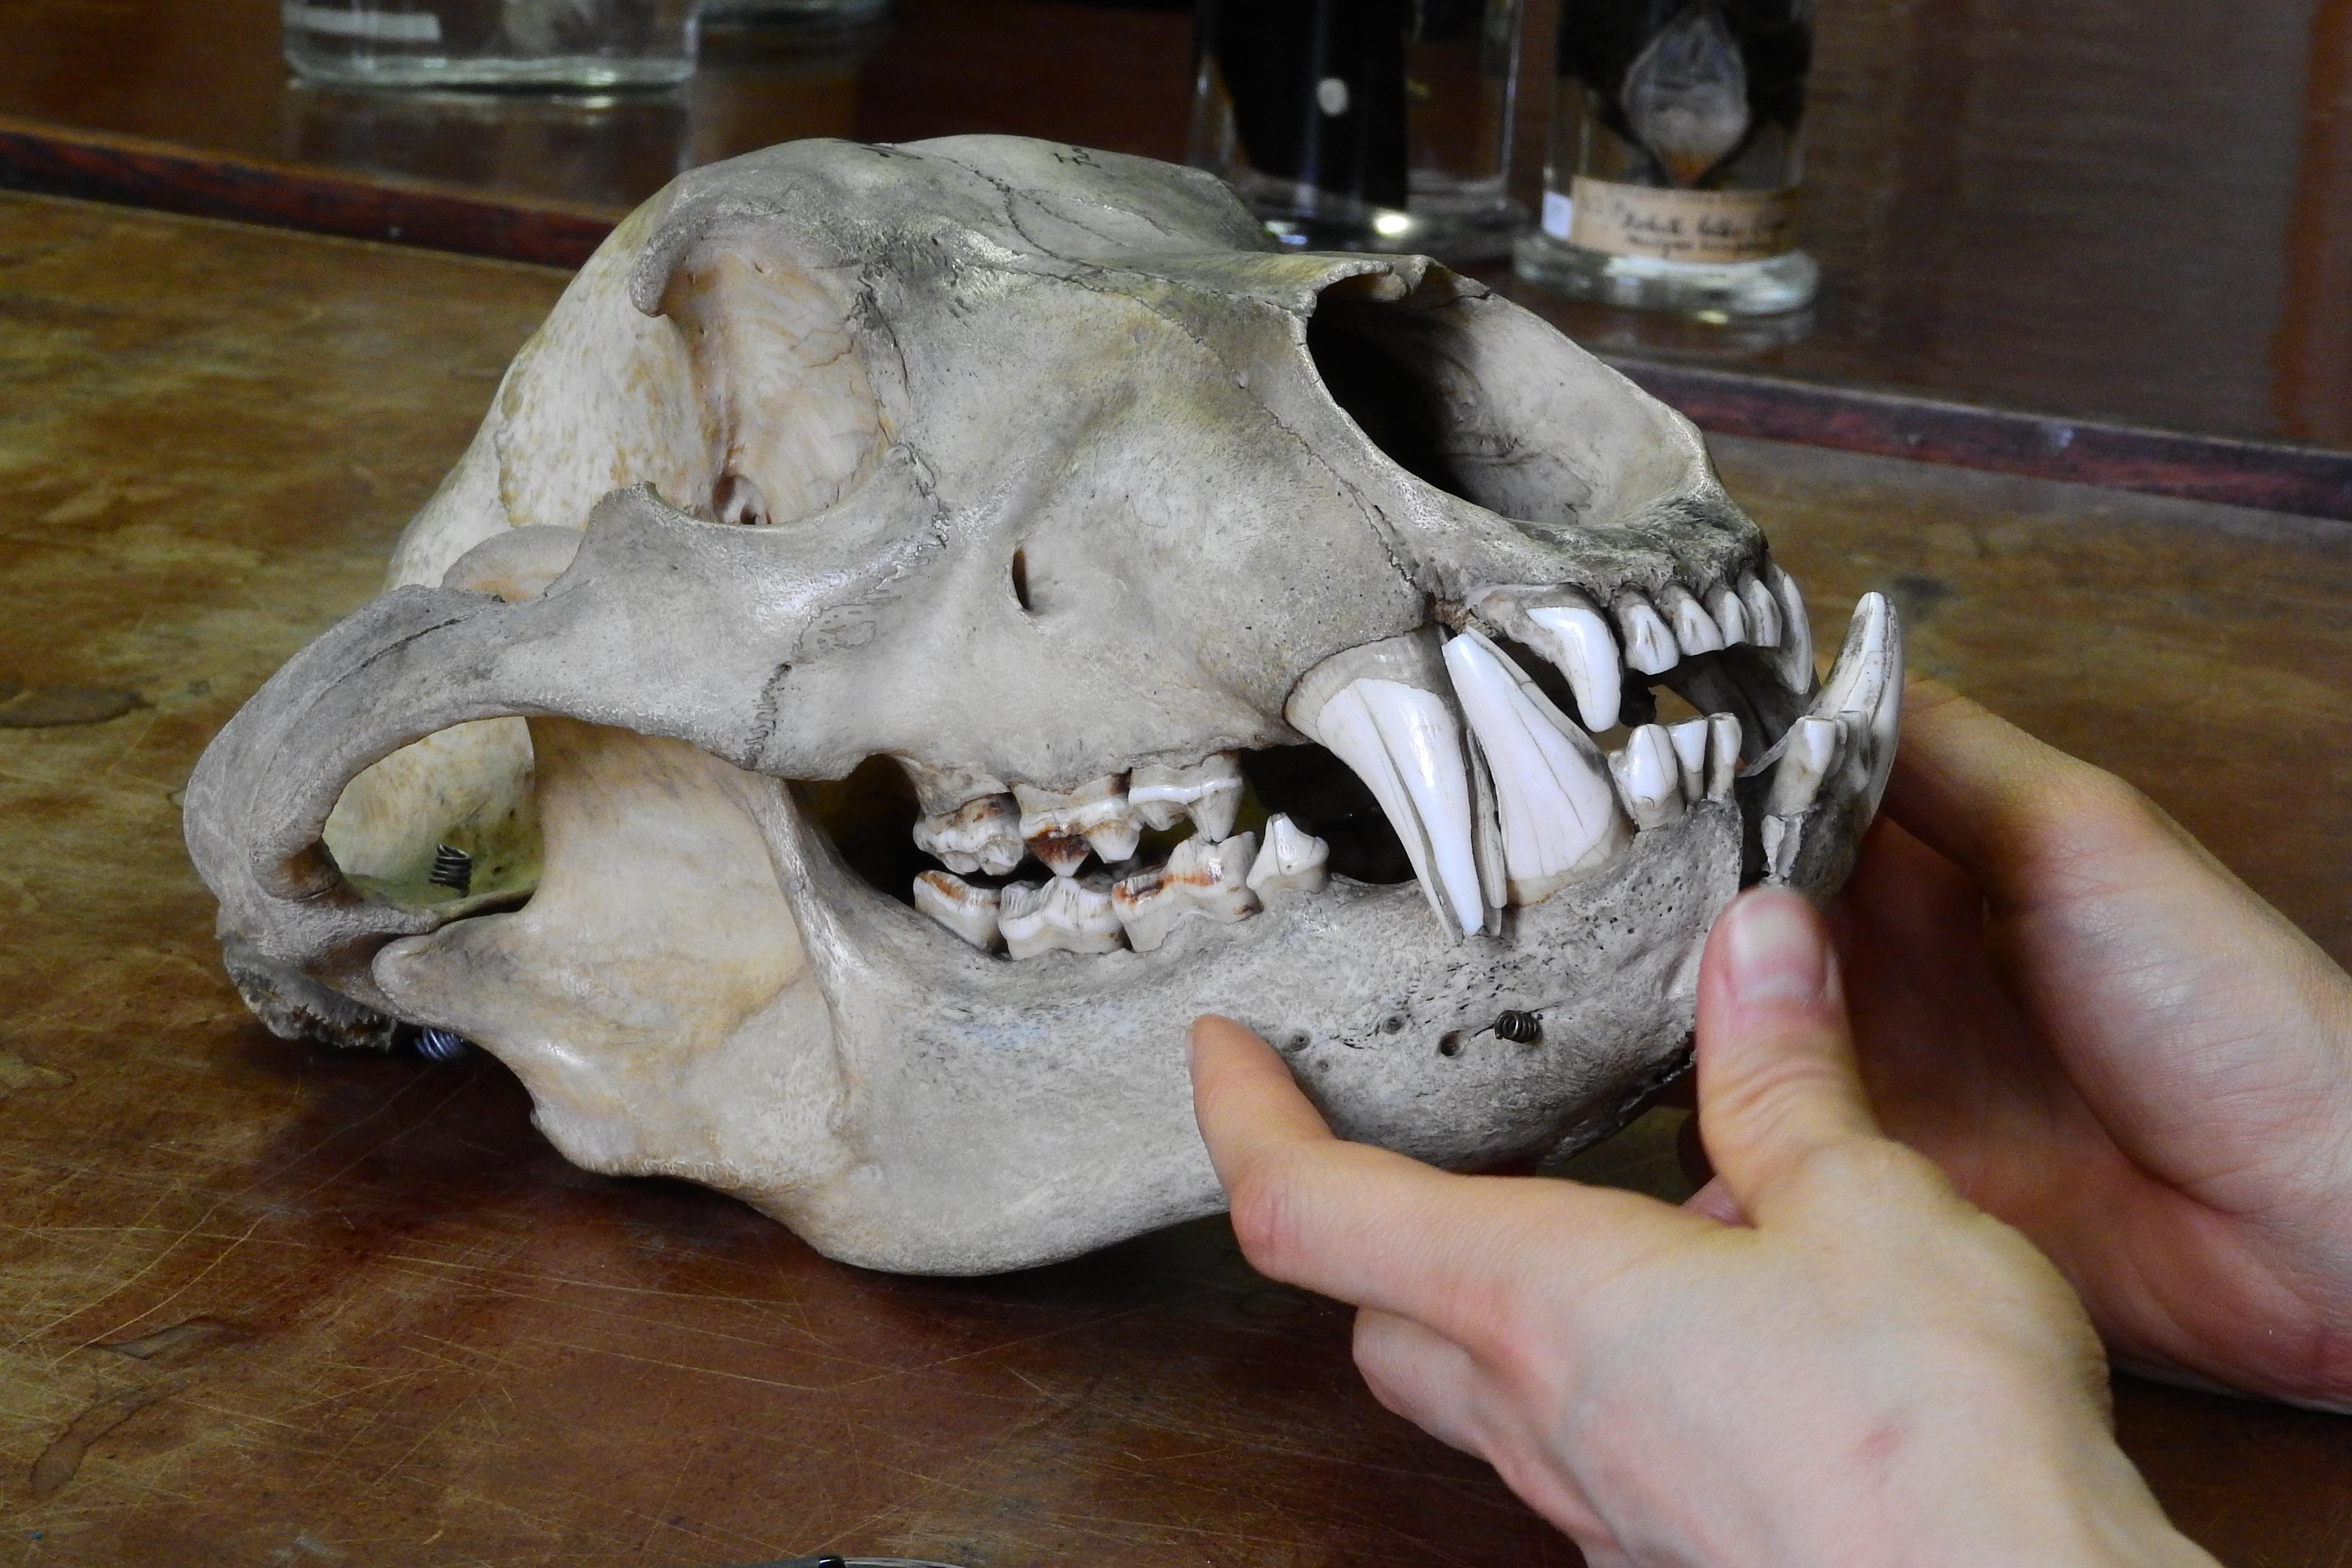 Free Images Bear Skull Bone Human Body Sculpture Art Head Bones Organ Teeth Carving Ursus Jaw 4608x3072 494981 Free Stock Photos Pxhere